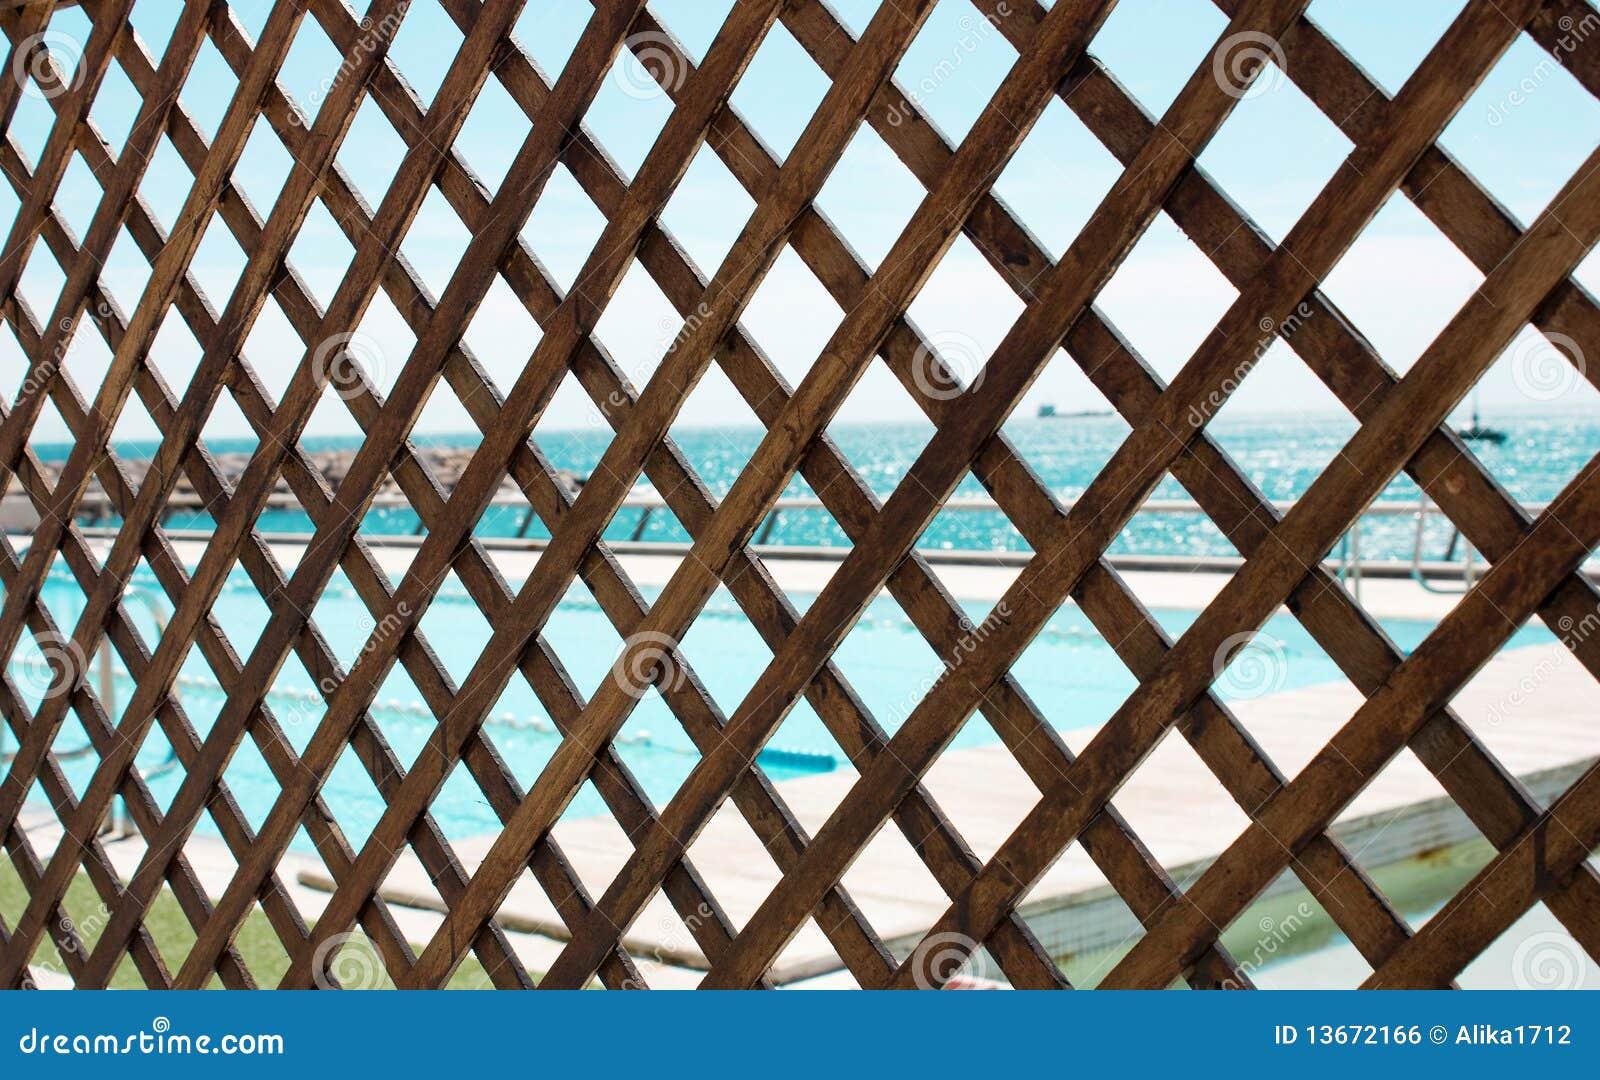 Wood grating royalty free stock image image 13672166 - Rejas de madera ...